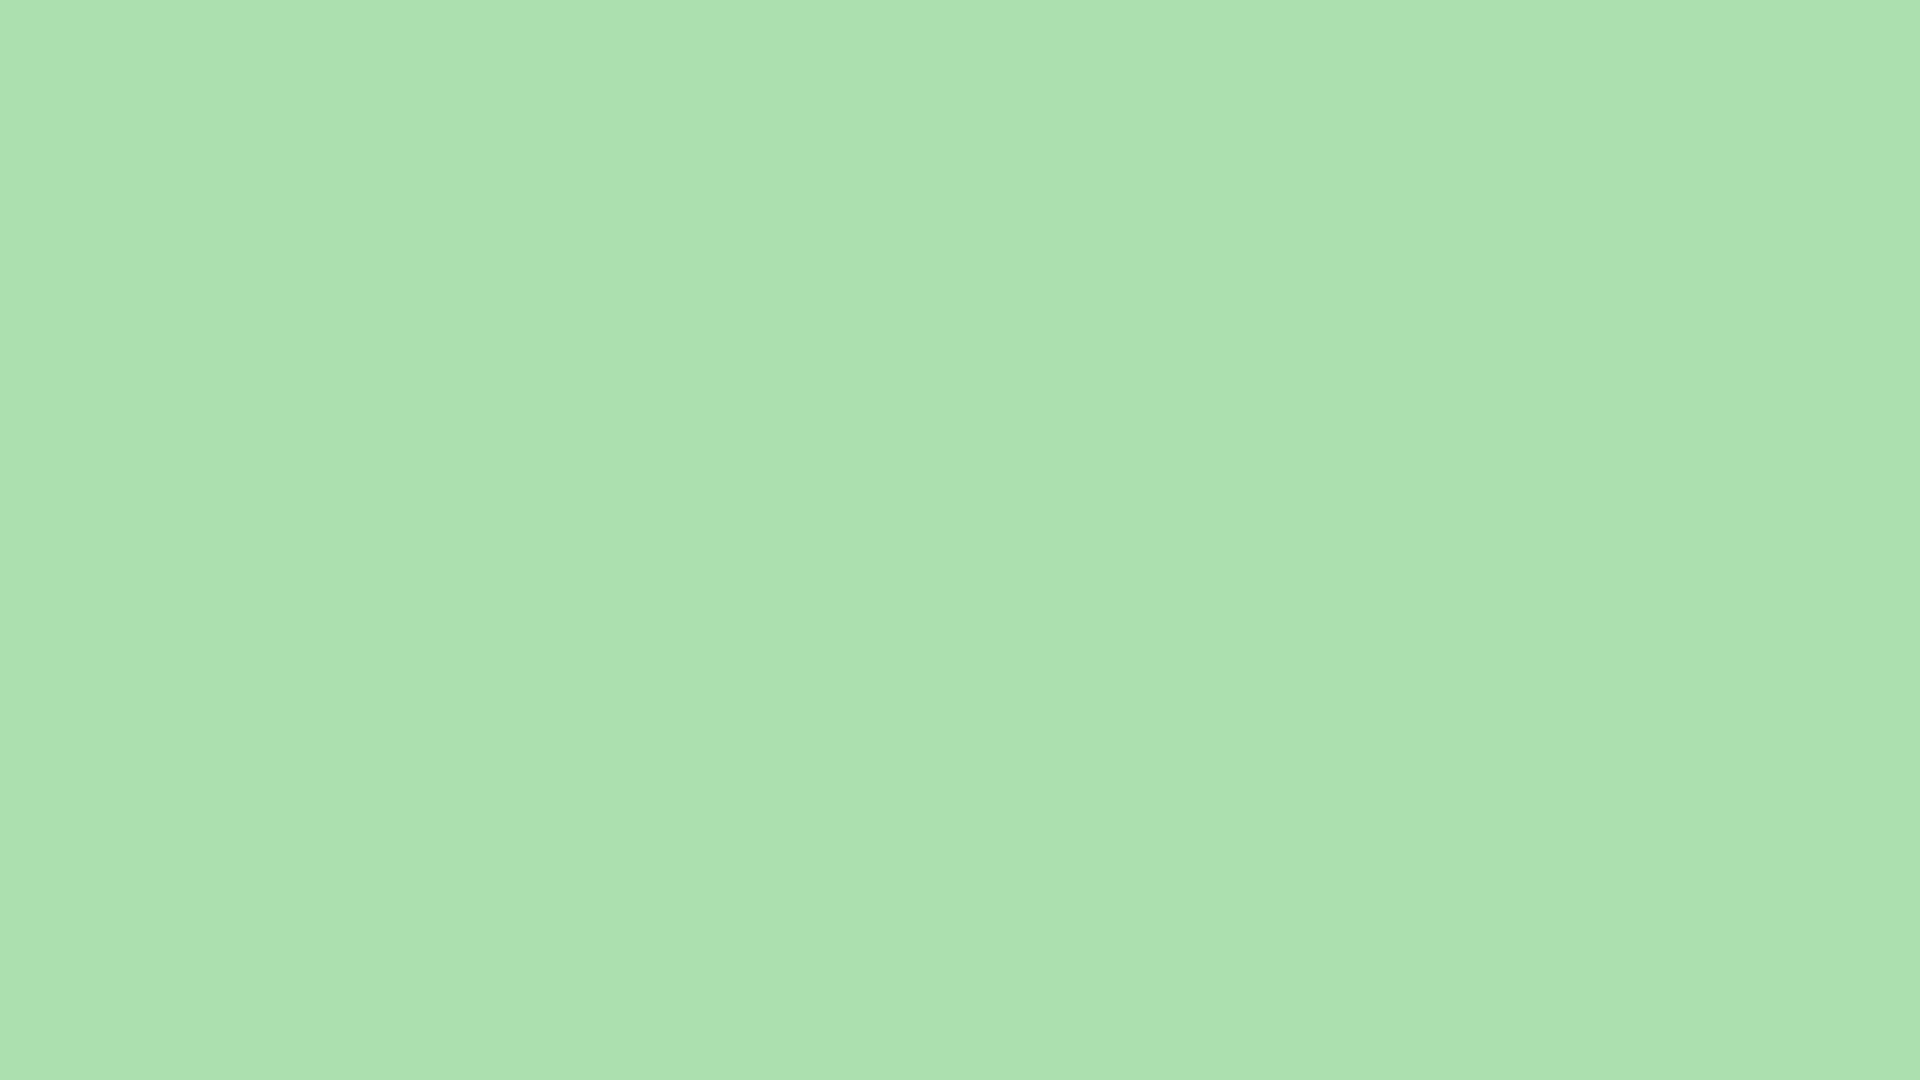 1920x1080 Celadon Solid Color Background